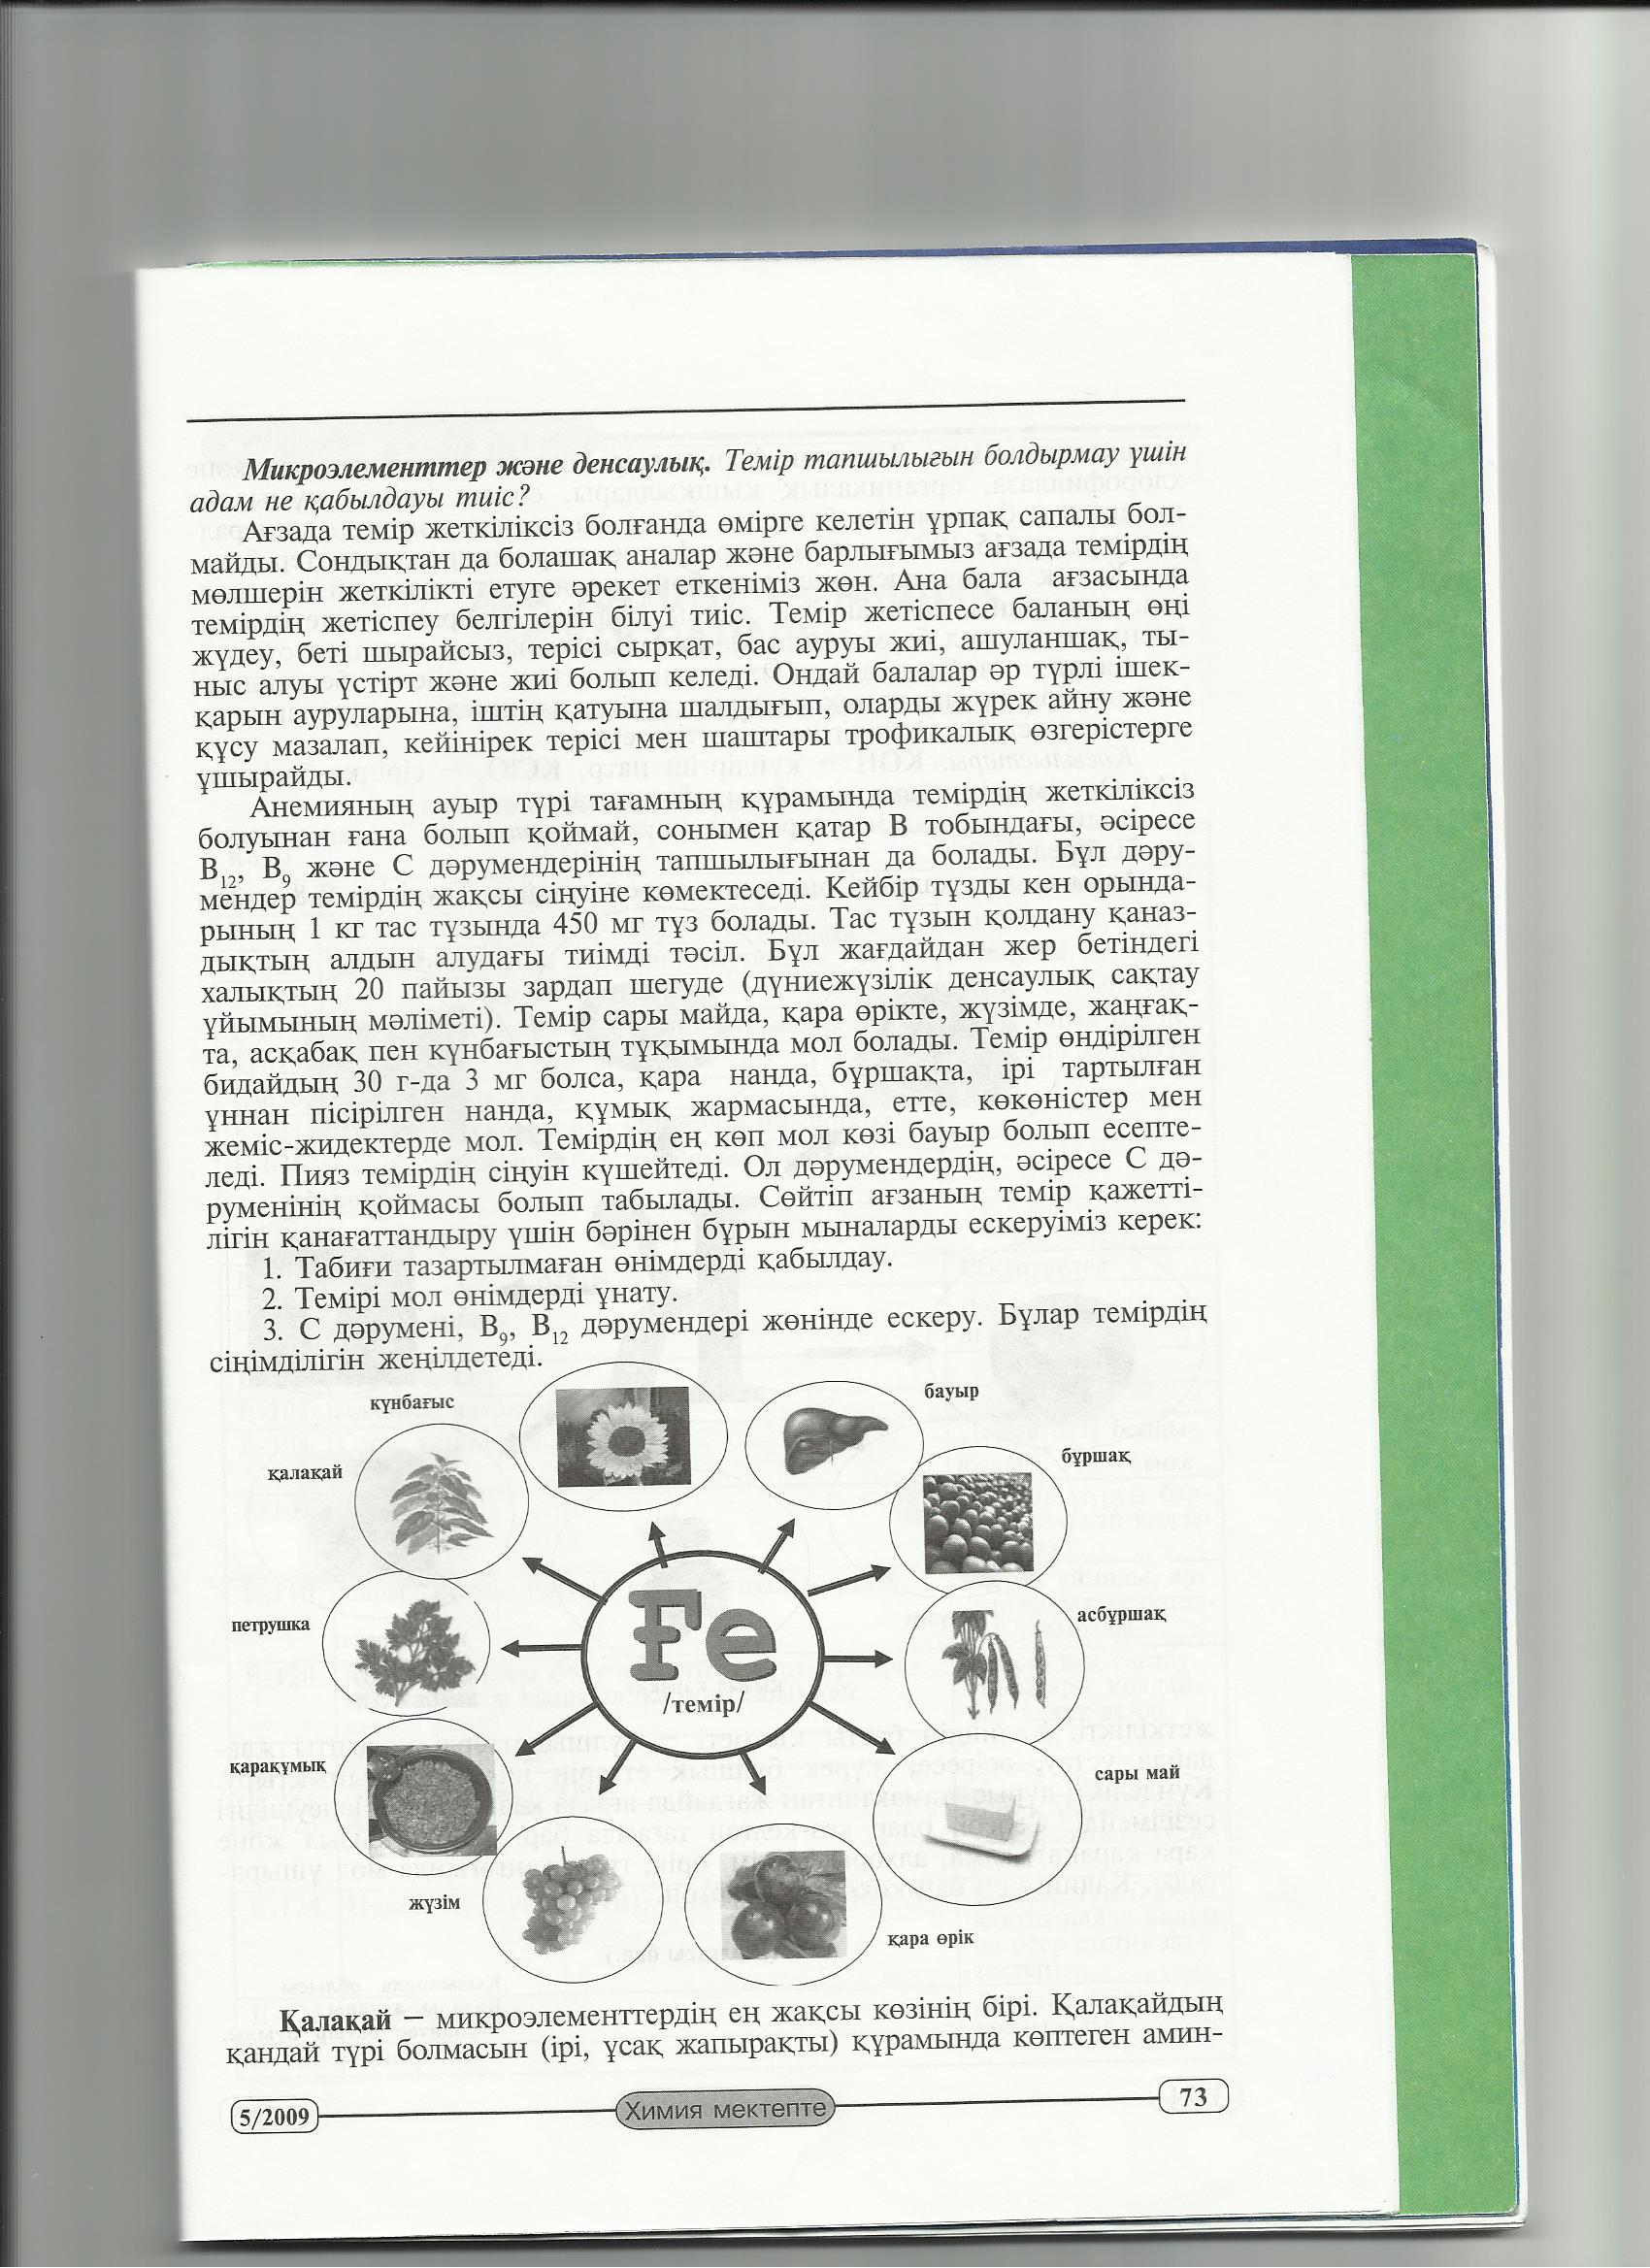 C:\Documents and Settings\Администратор\Рабочий стол\Новая папка (3)\15.jpg